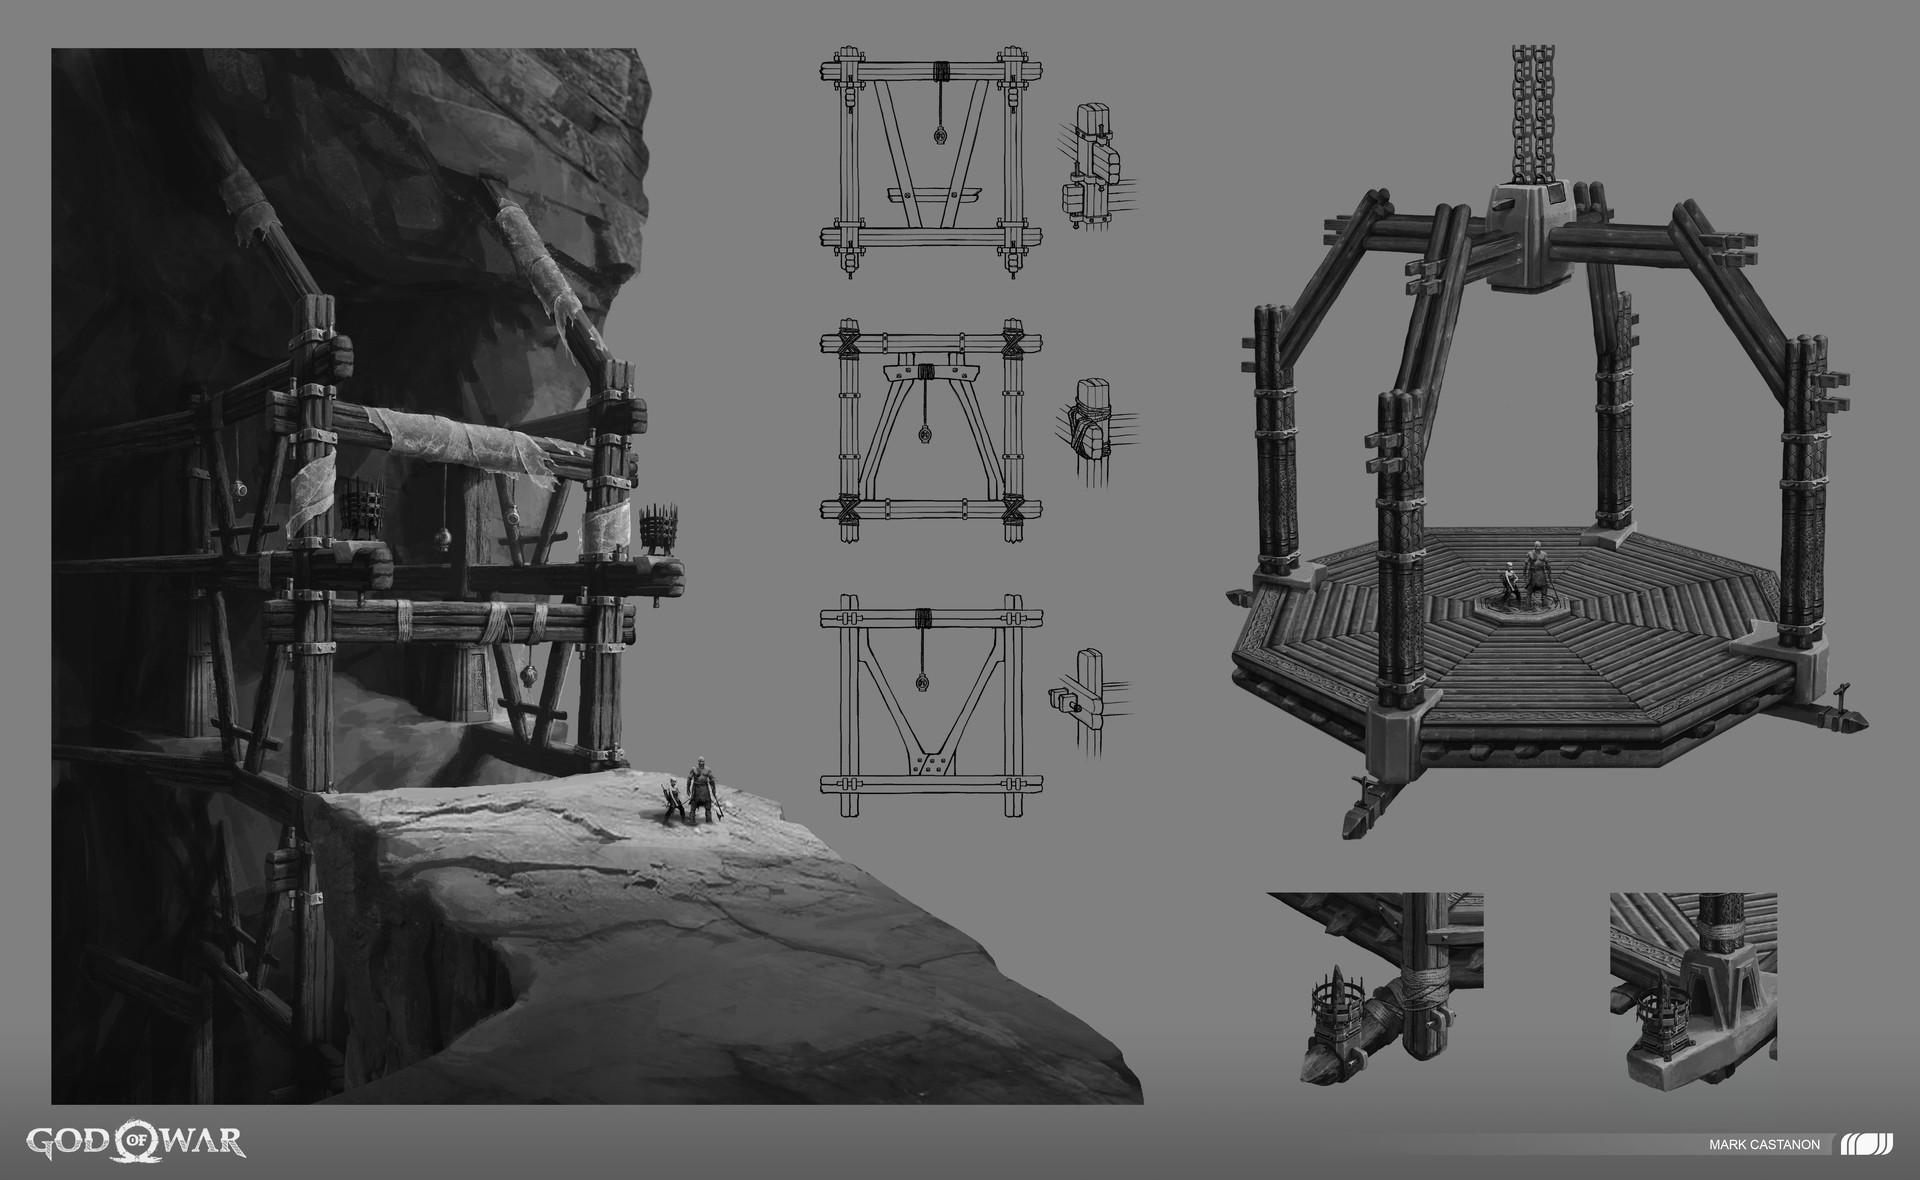 mark-castanon-pp-elevatorstructure-andelevator-mc-01-001.jpg